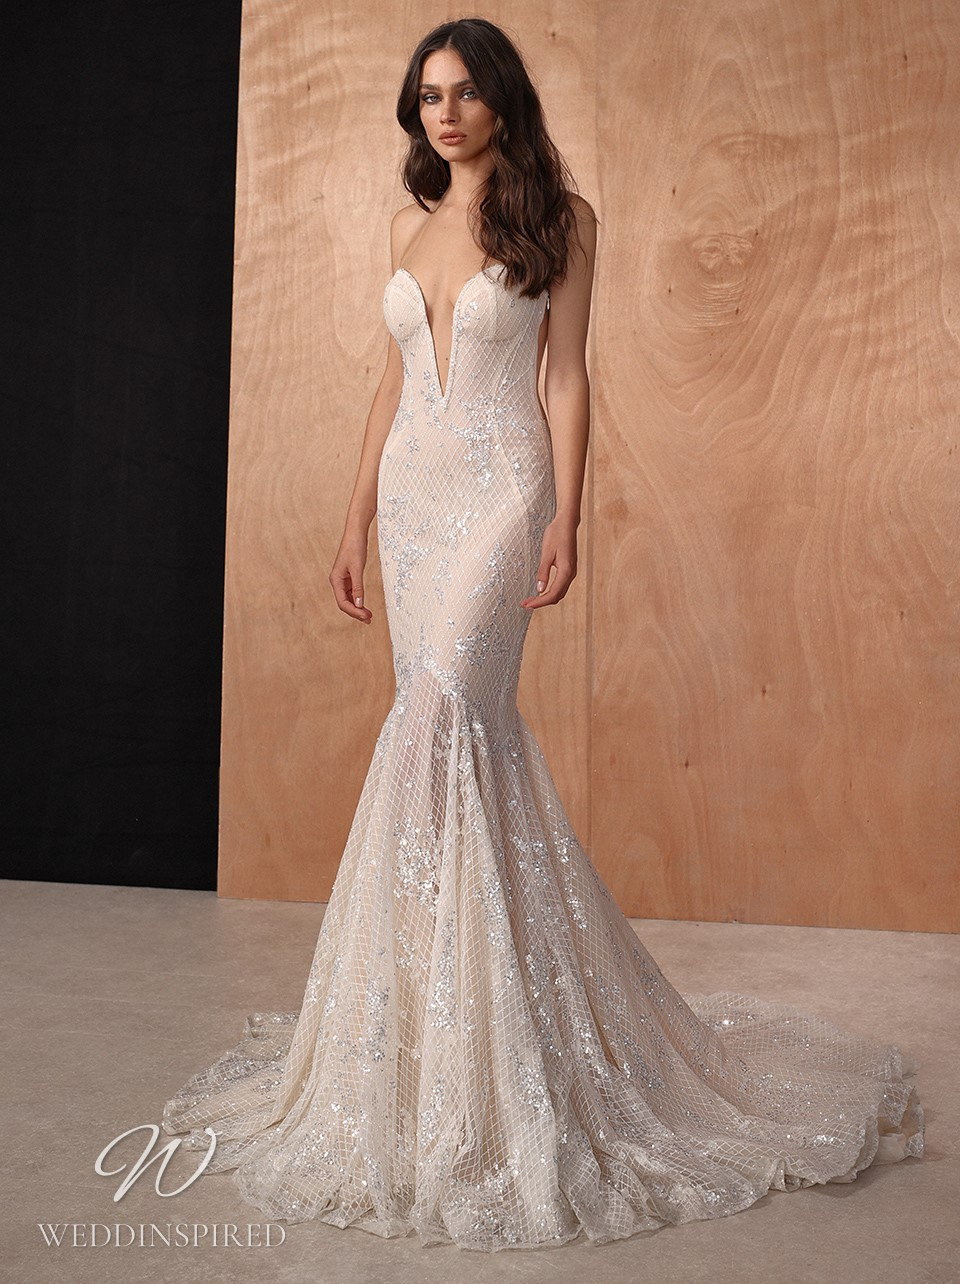 A Galia Lahav 2022 sparkly blush strapless mermaid wedding dress with a v neck